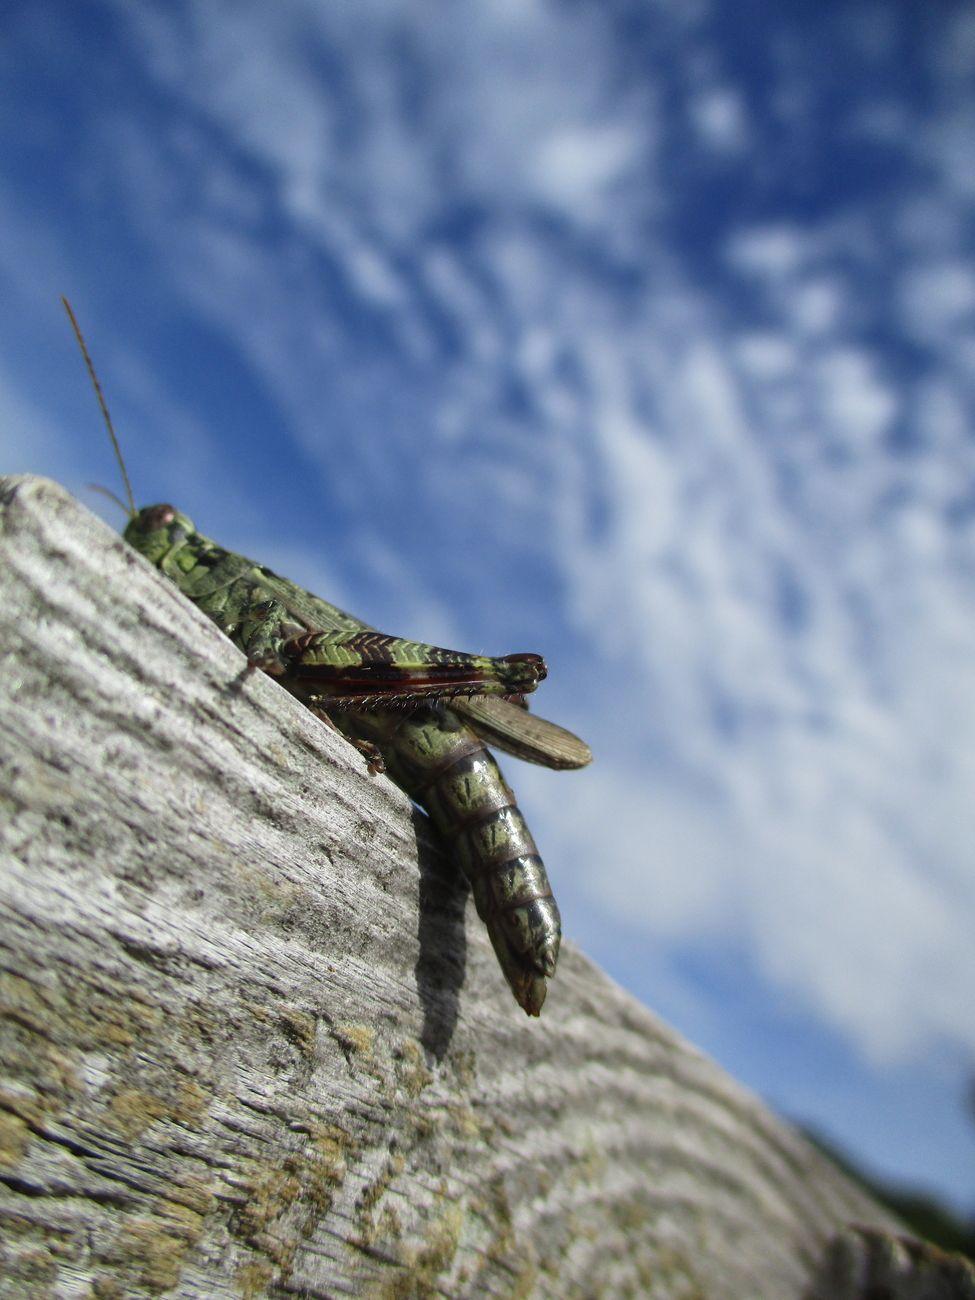 Emerald Grasshopper by Yannis Lobaina.